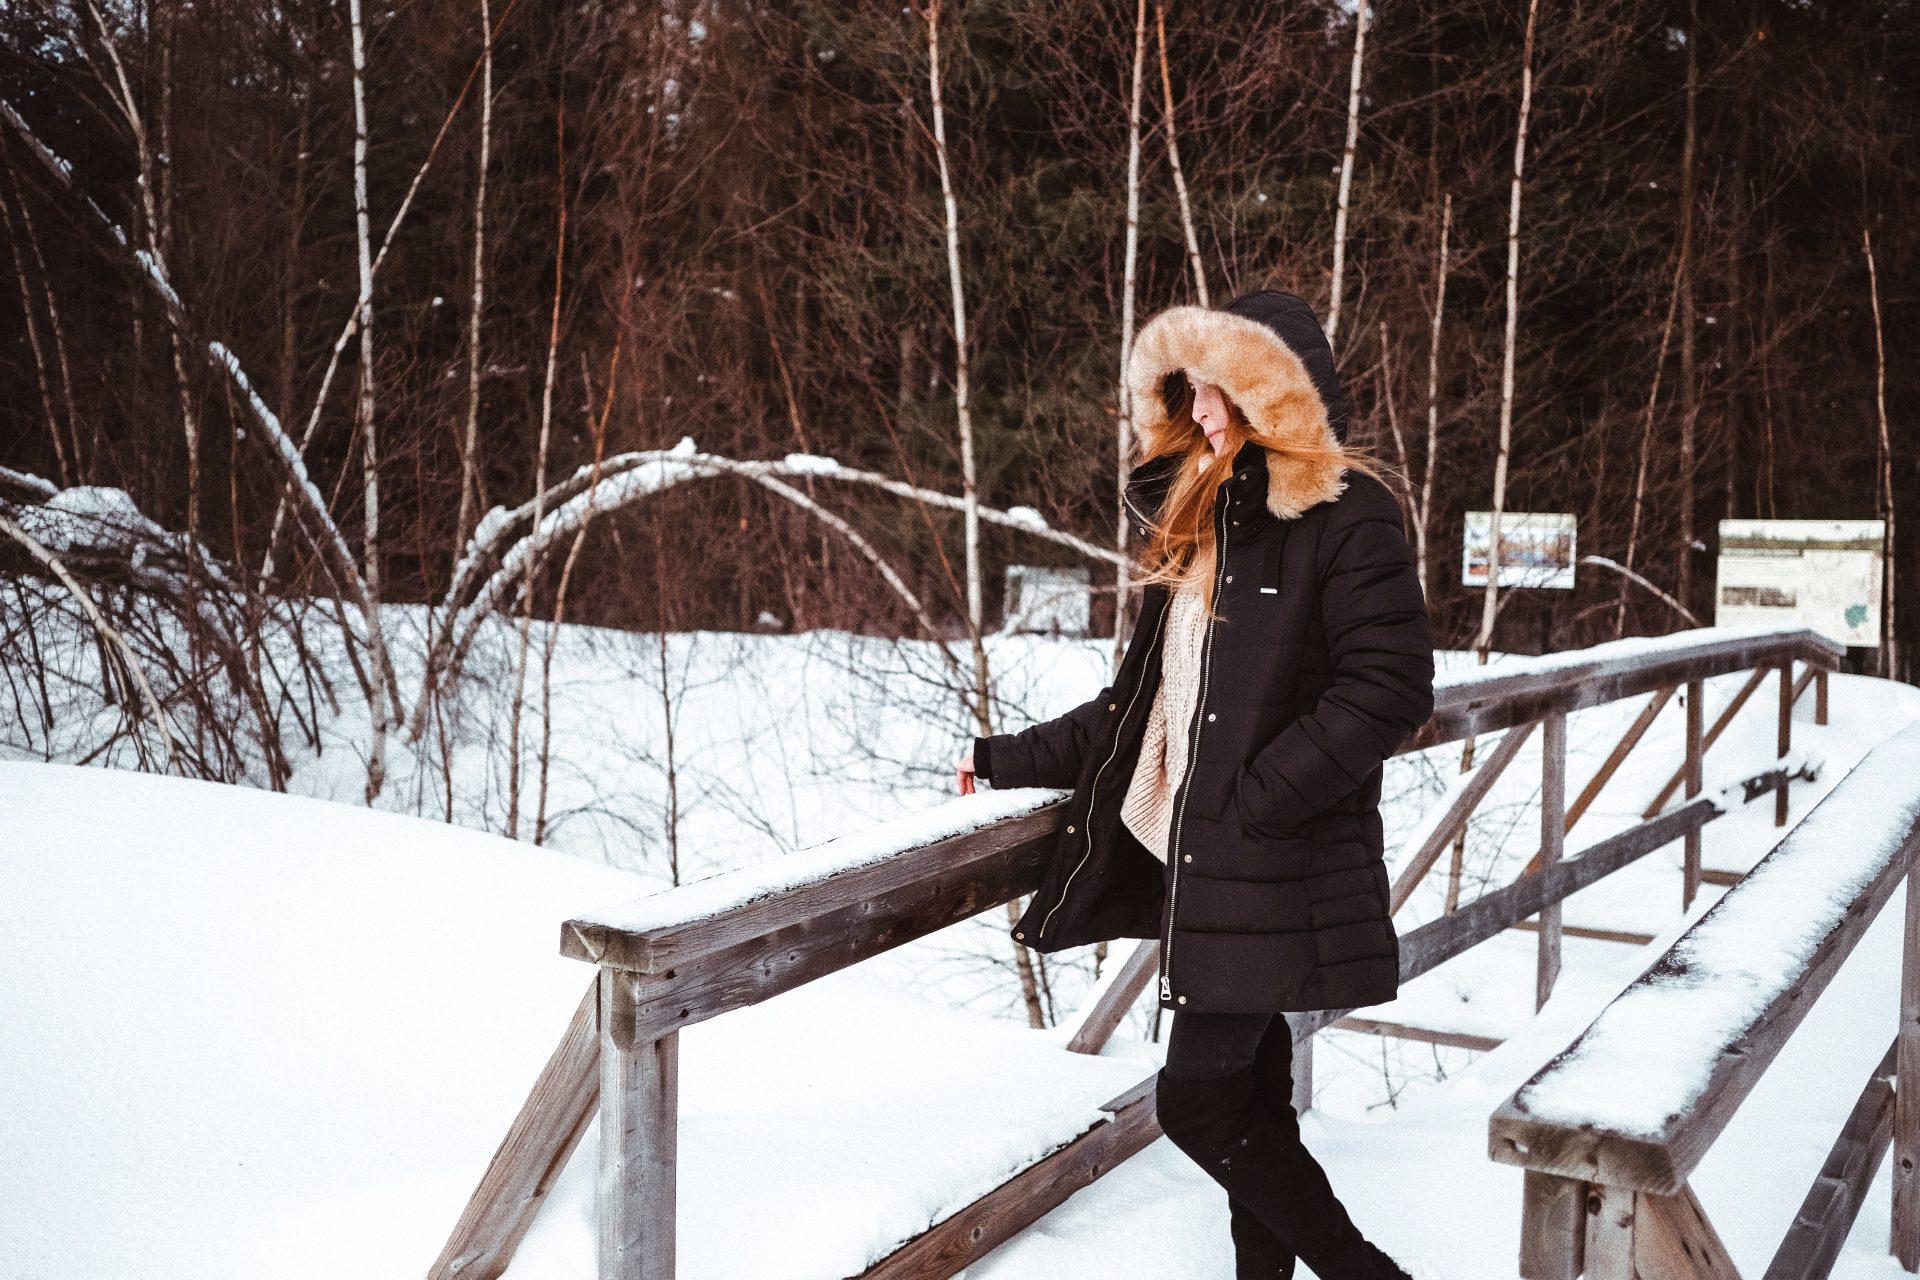 Stéphanie Larochelle, hiver, Anxiété